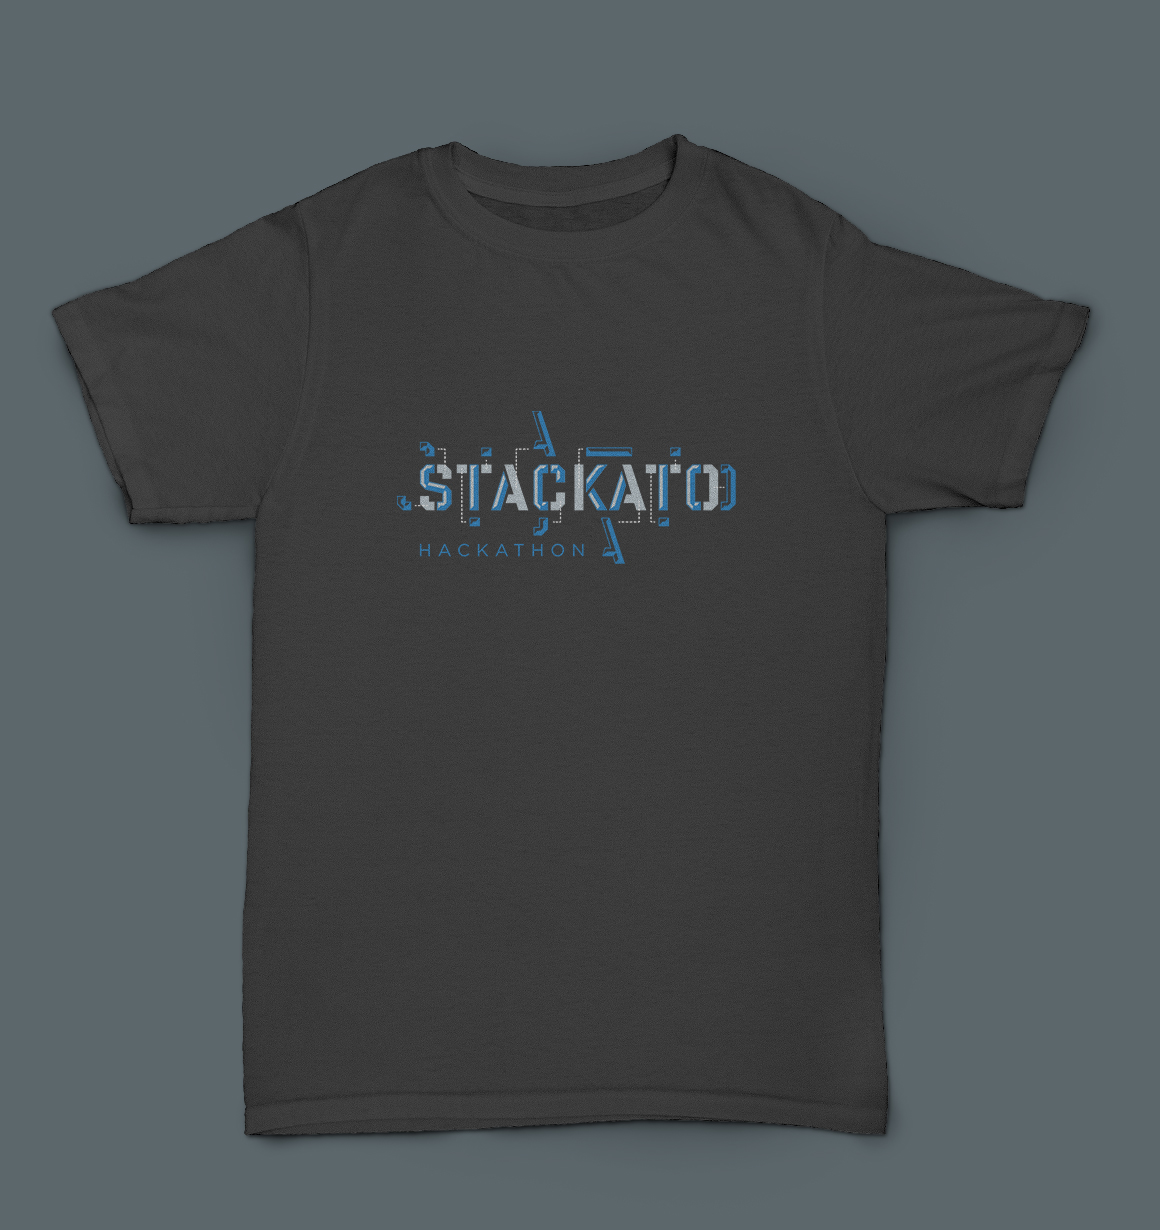 Stackato_Hackathon_Shirt_Mock.jpg